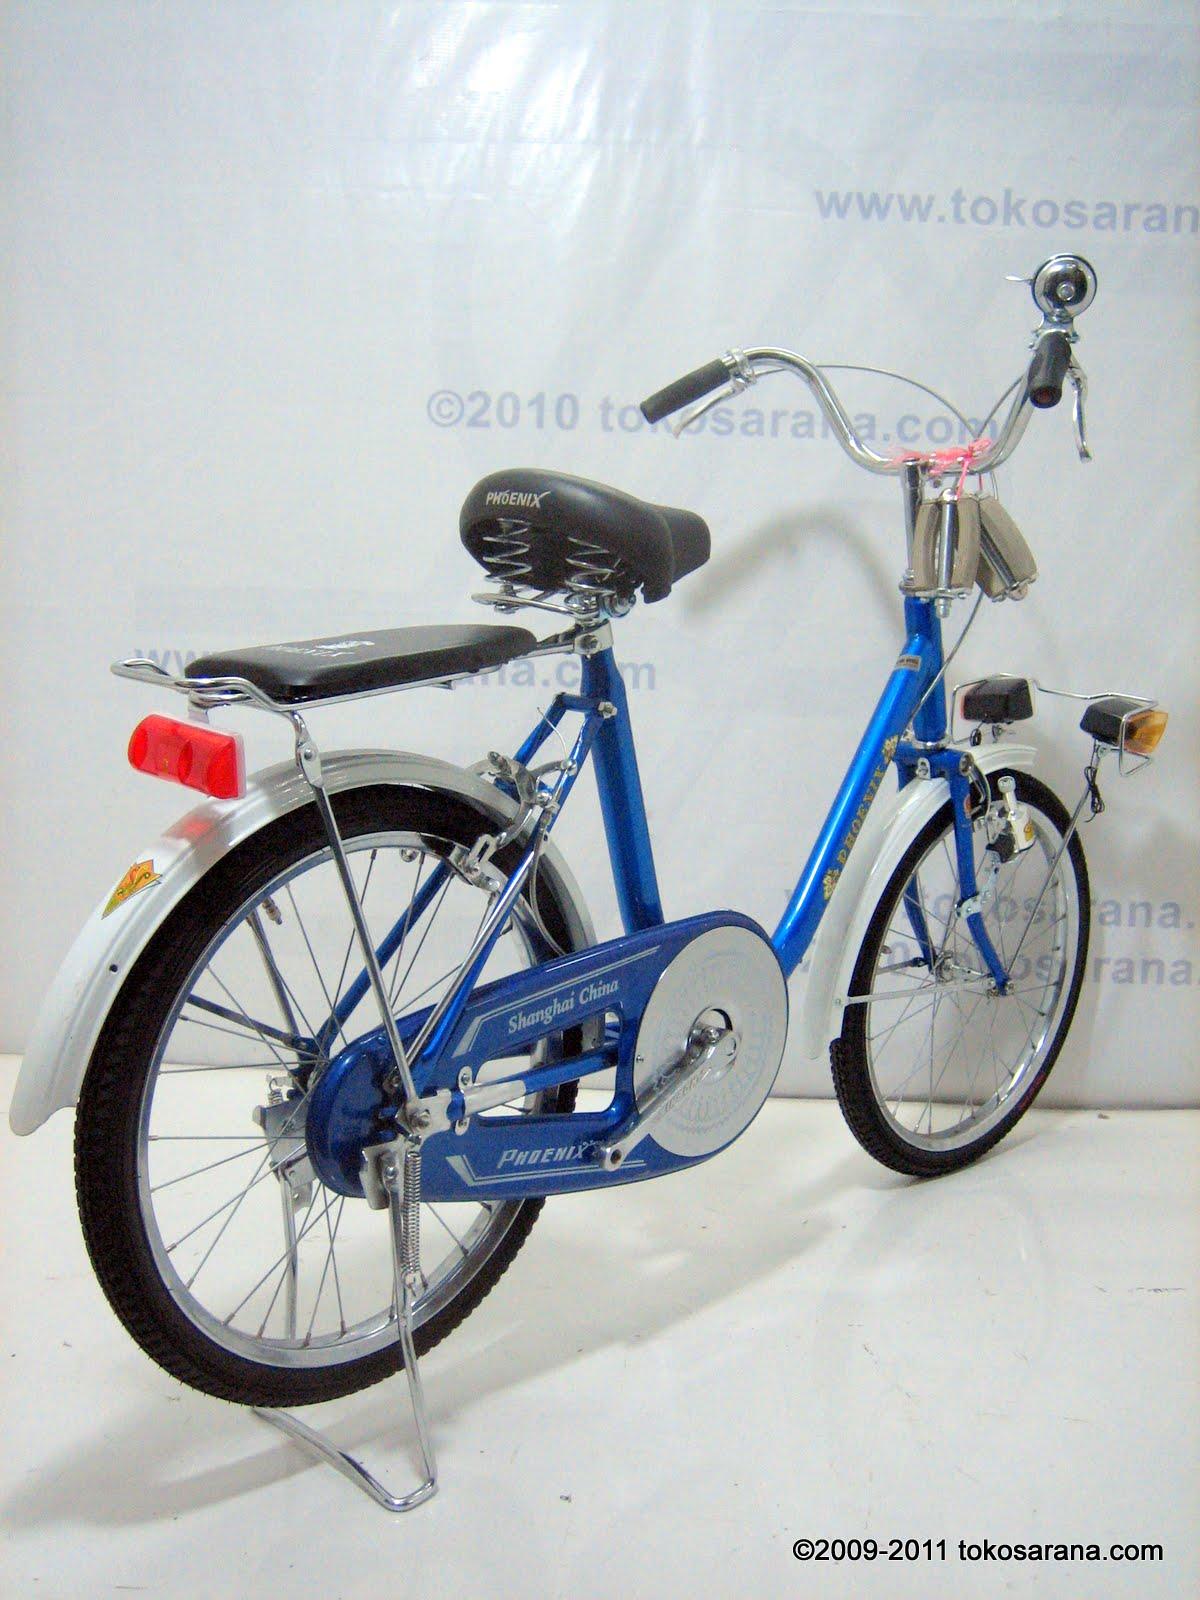 tokomagenta: A Showcase of Products: Sepeda Mini PHOENIX